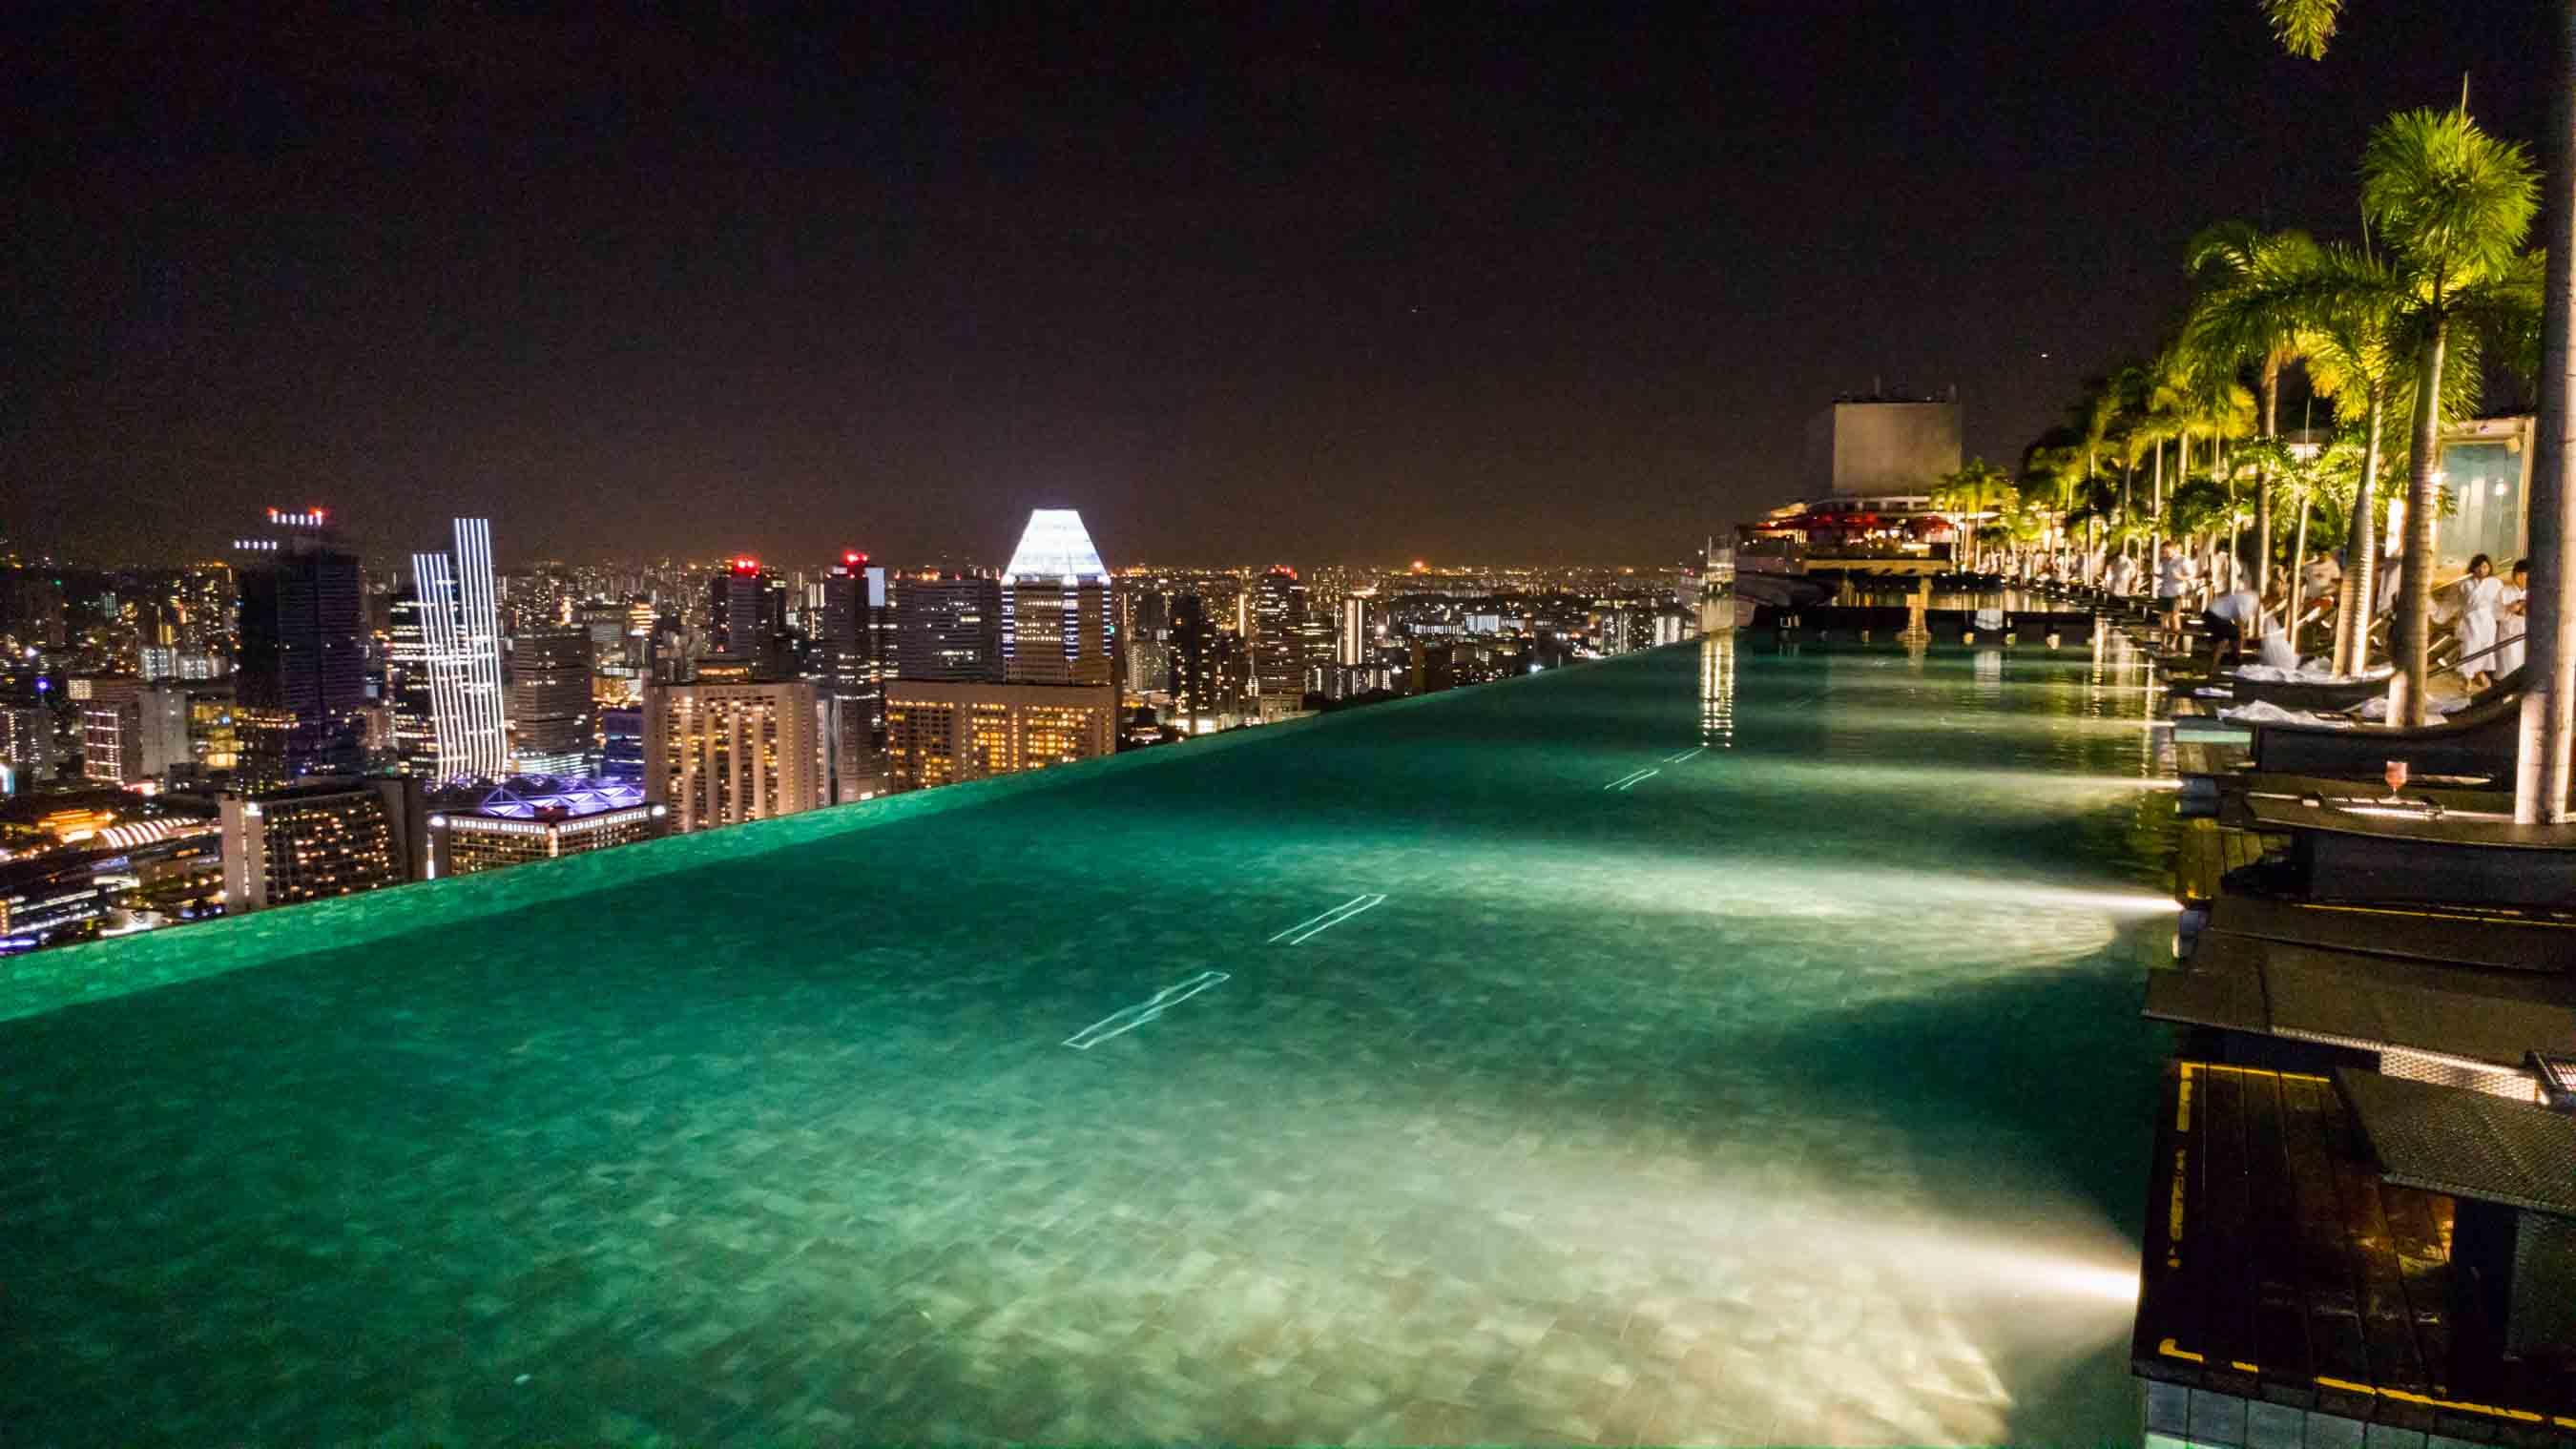 Singapore Pescart Enrico Pescantini Marina Bay Sands Hotel Infinity Pool 3